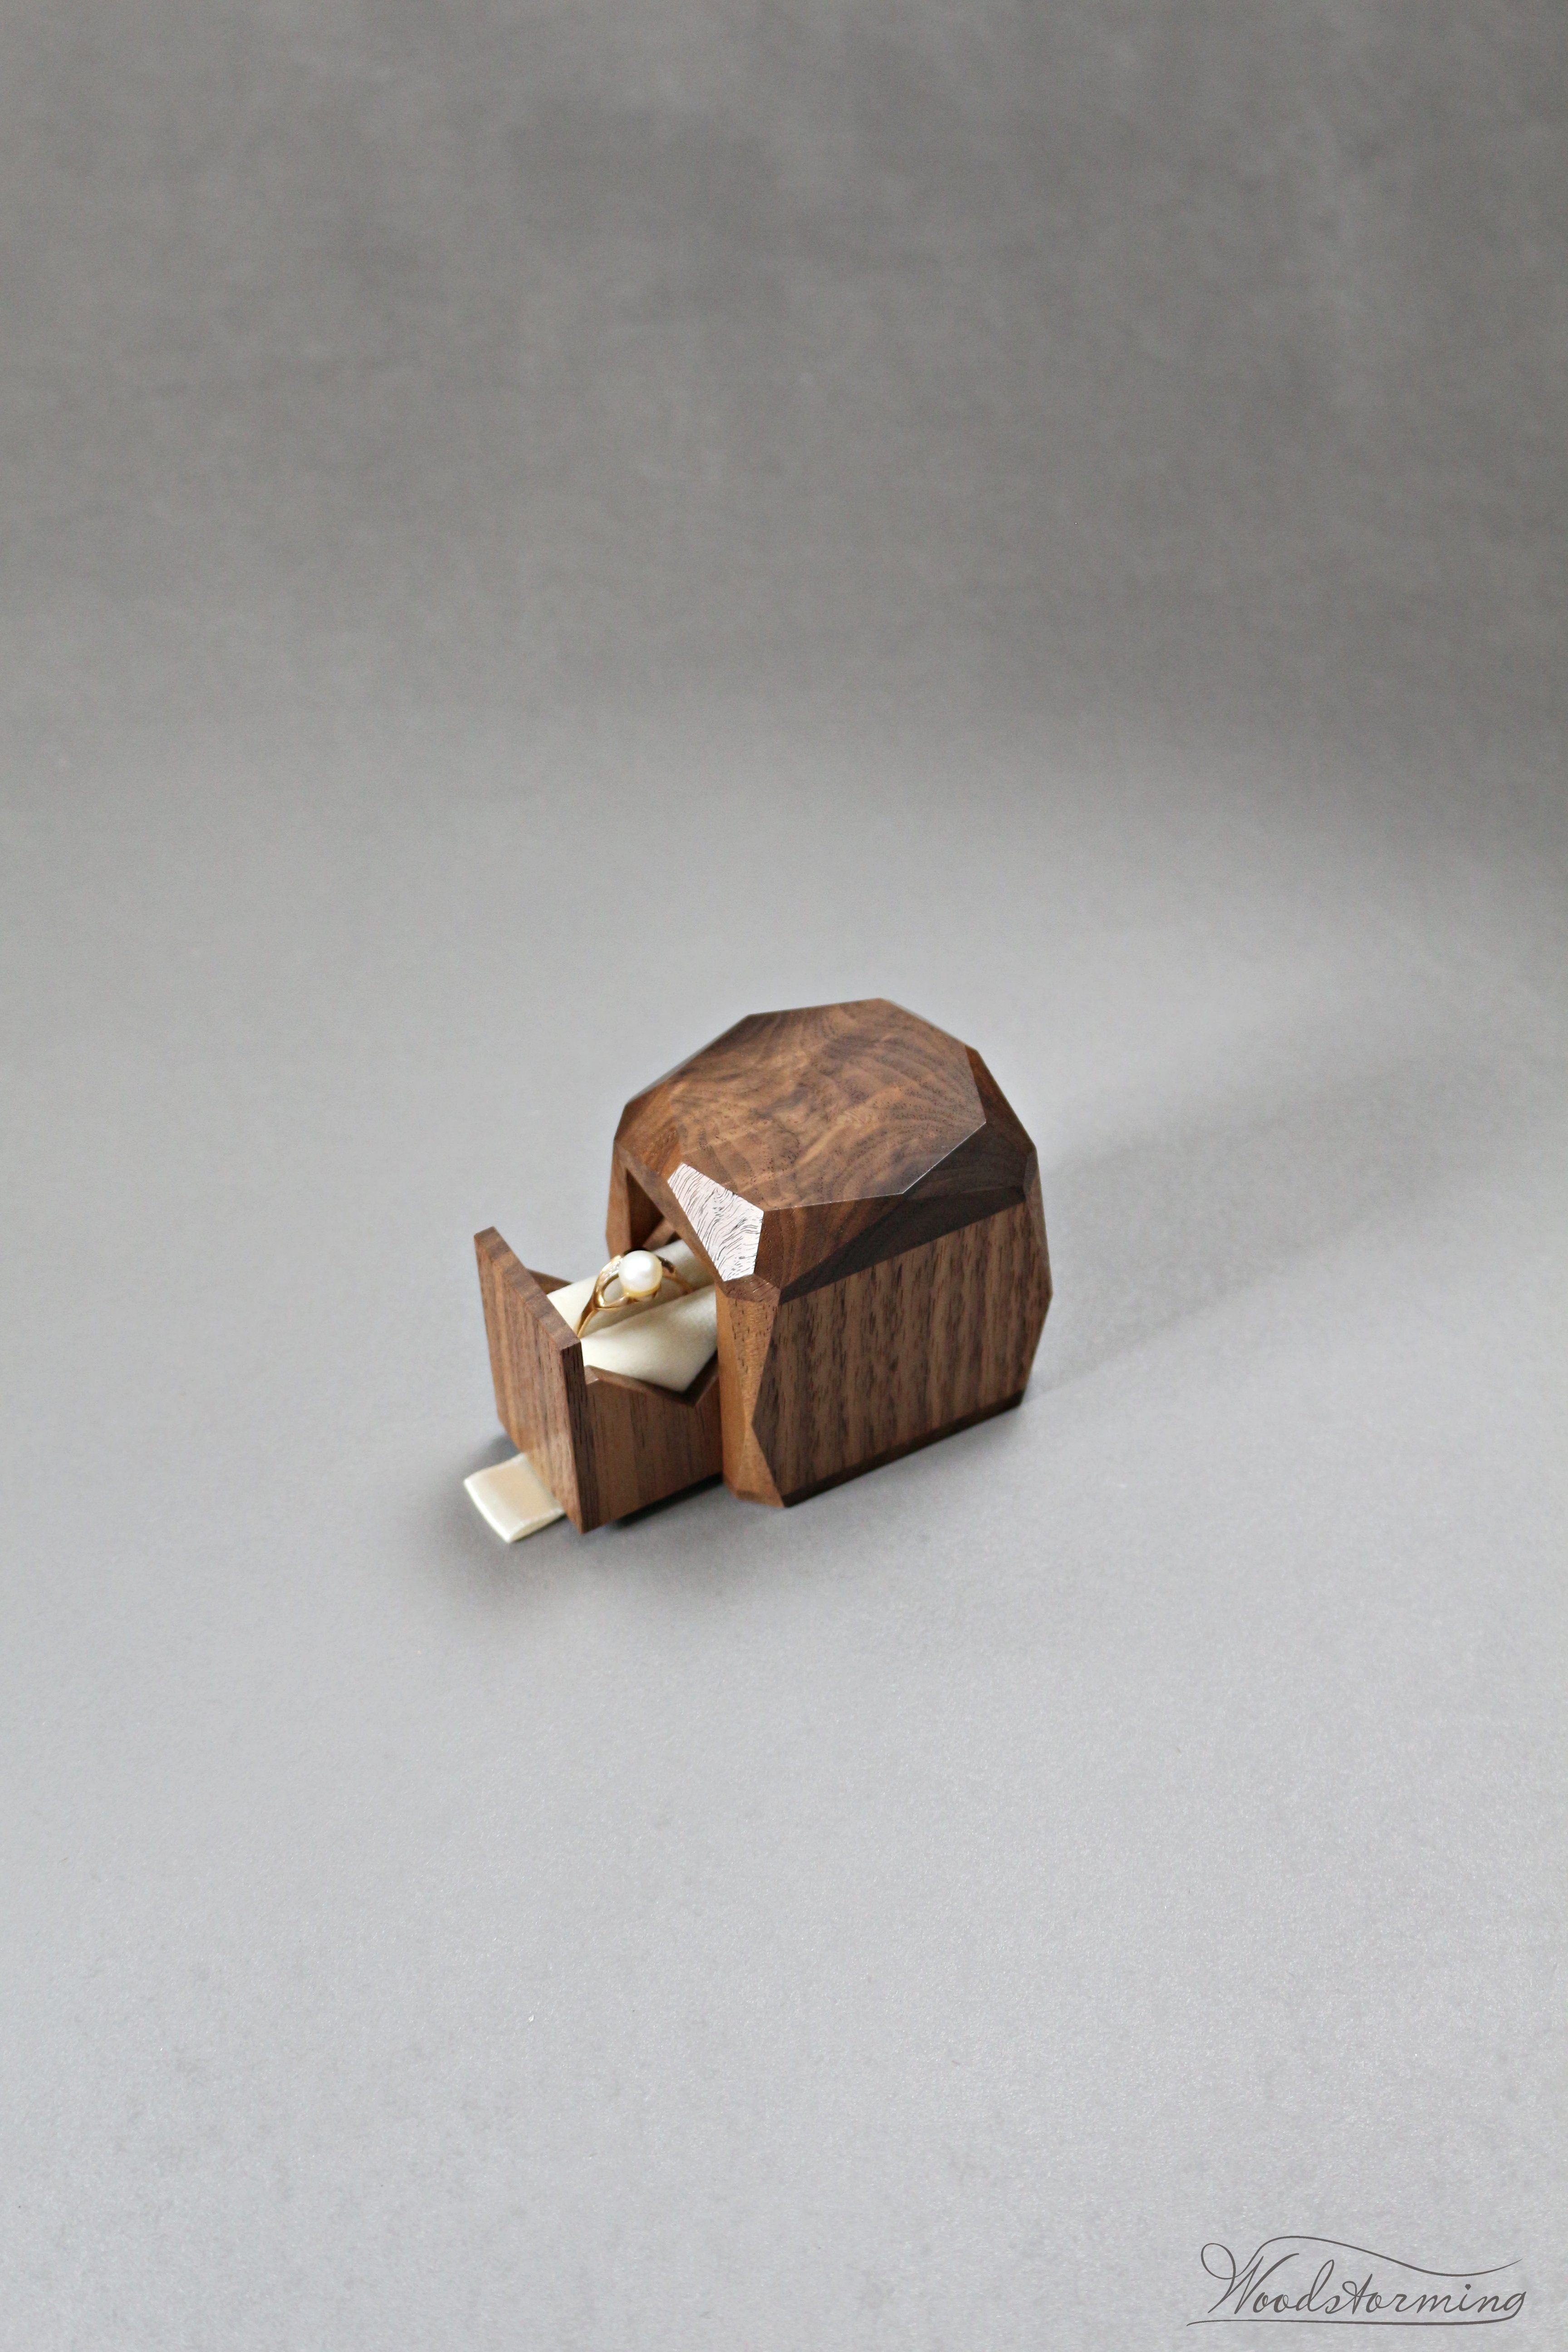 Wonderful Ring Box Wooden Ring Box Wedding Unique Ring Box Wood Ring Box Engagement